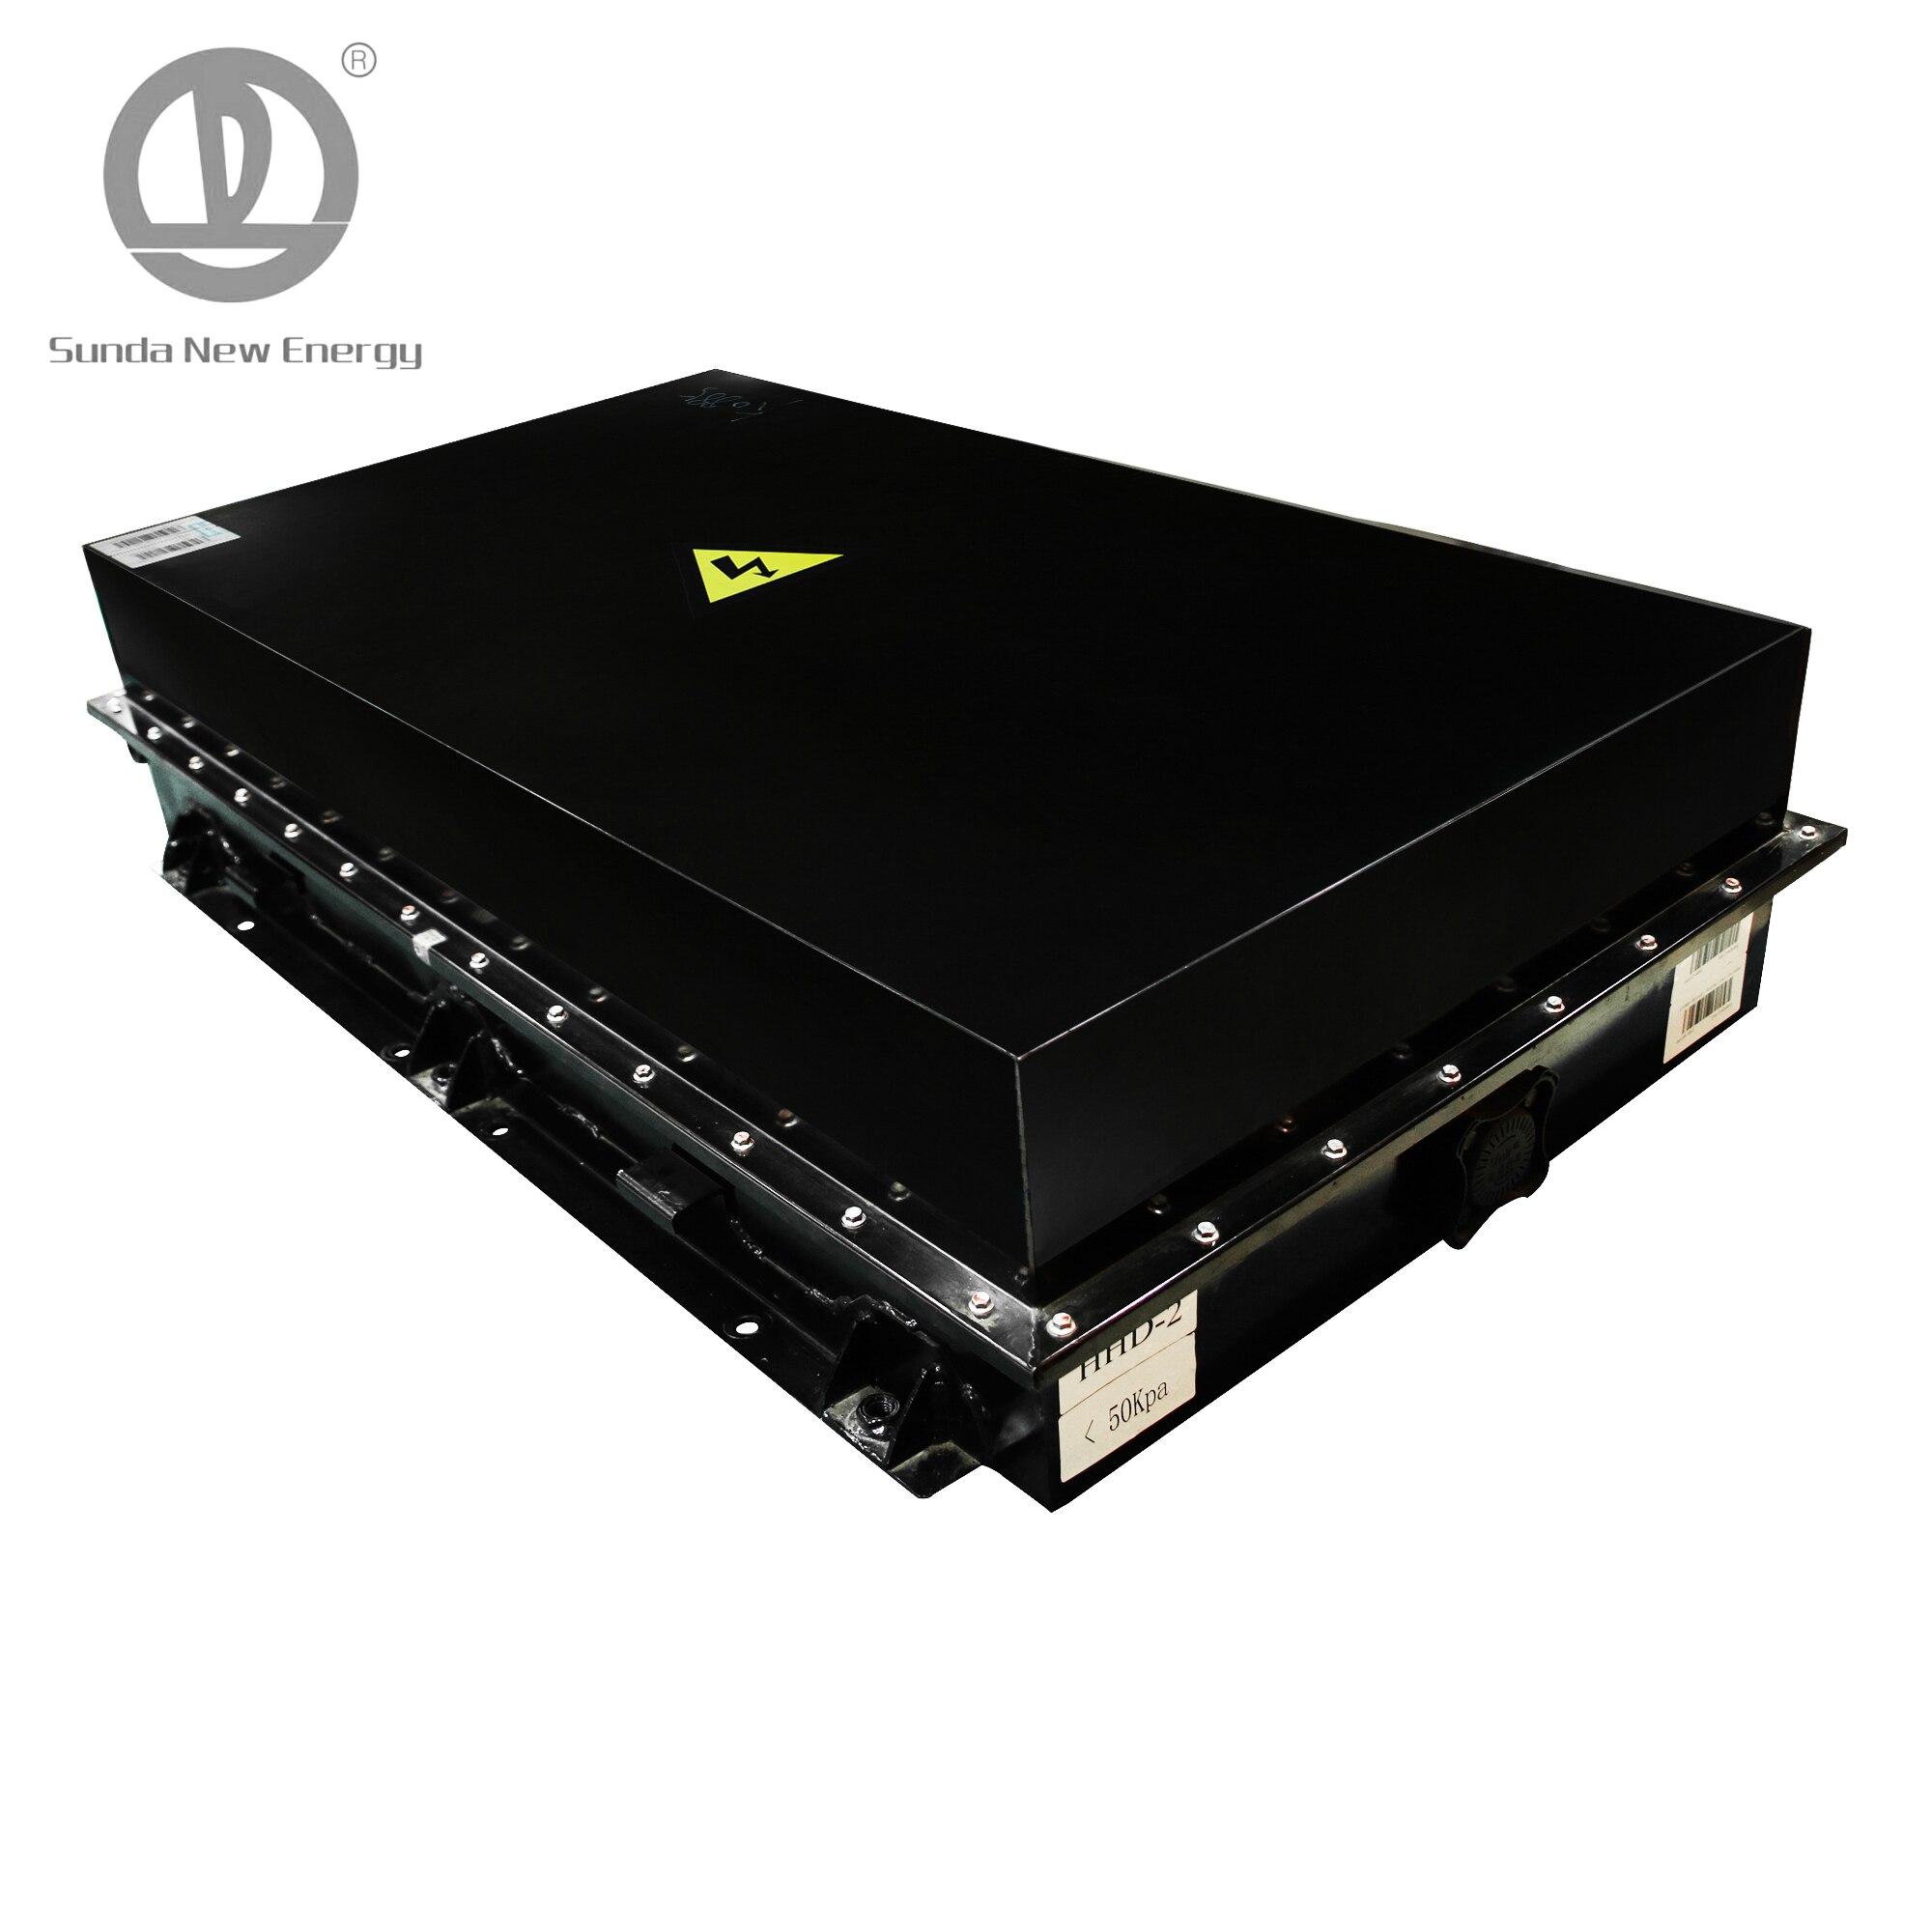 Sunda New Energy 36V 10Ah especializado batería de litio portátil para triciclo eléctrico